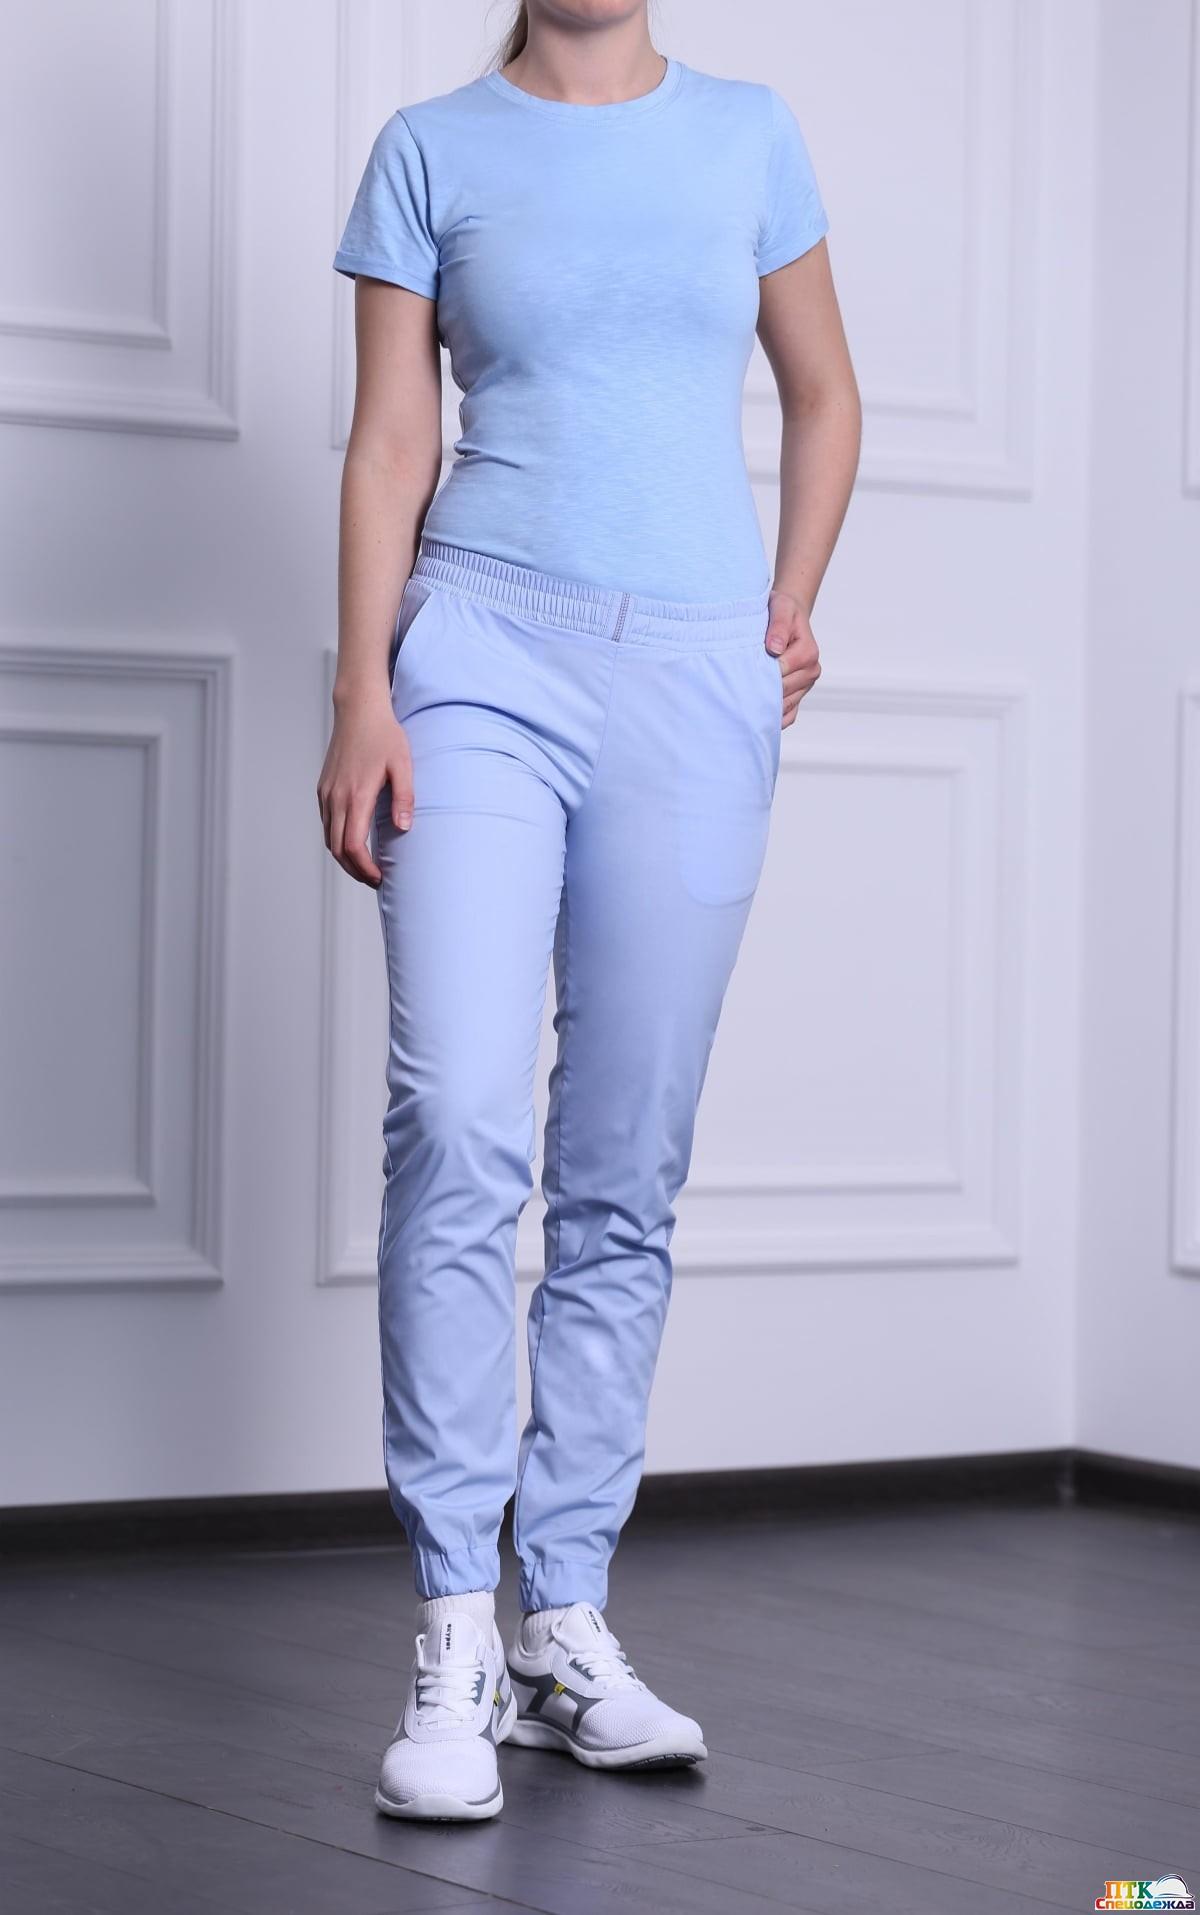 Брюки женские Релакс, голубые NEW (Брю 3403.06)